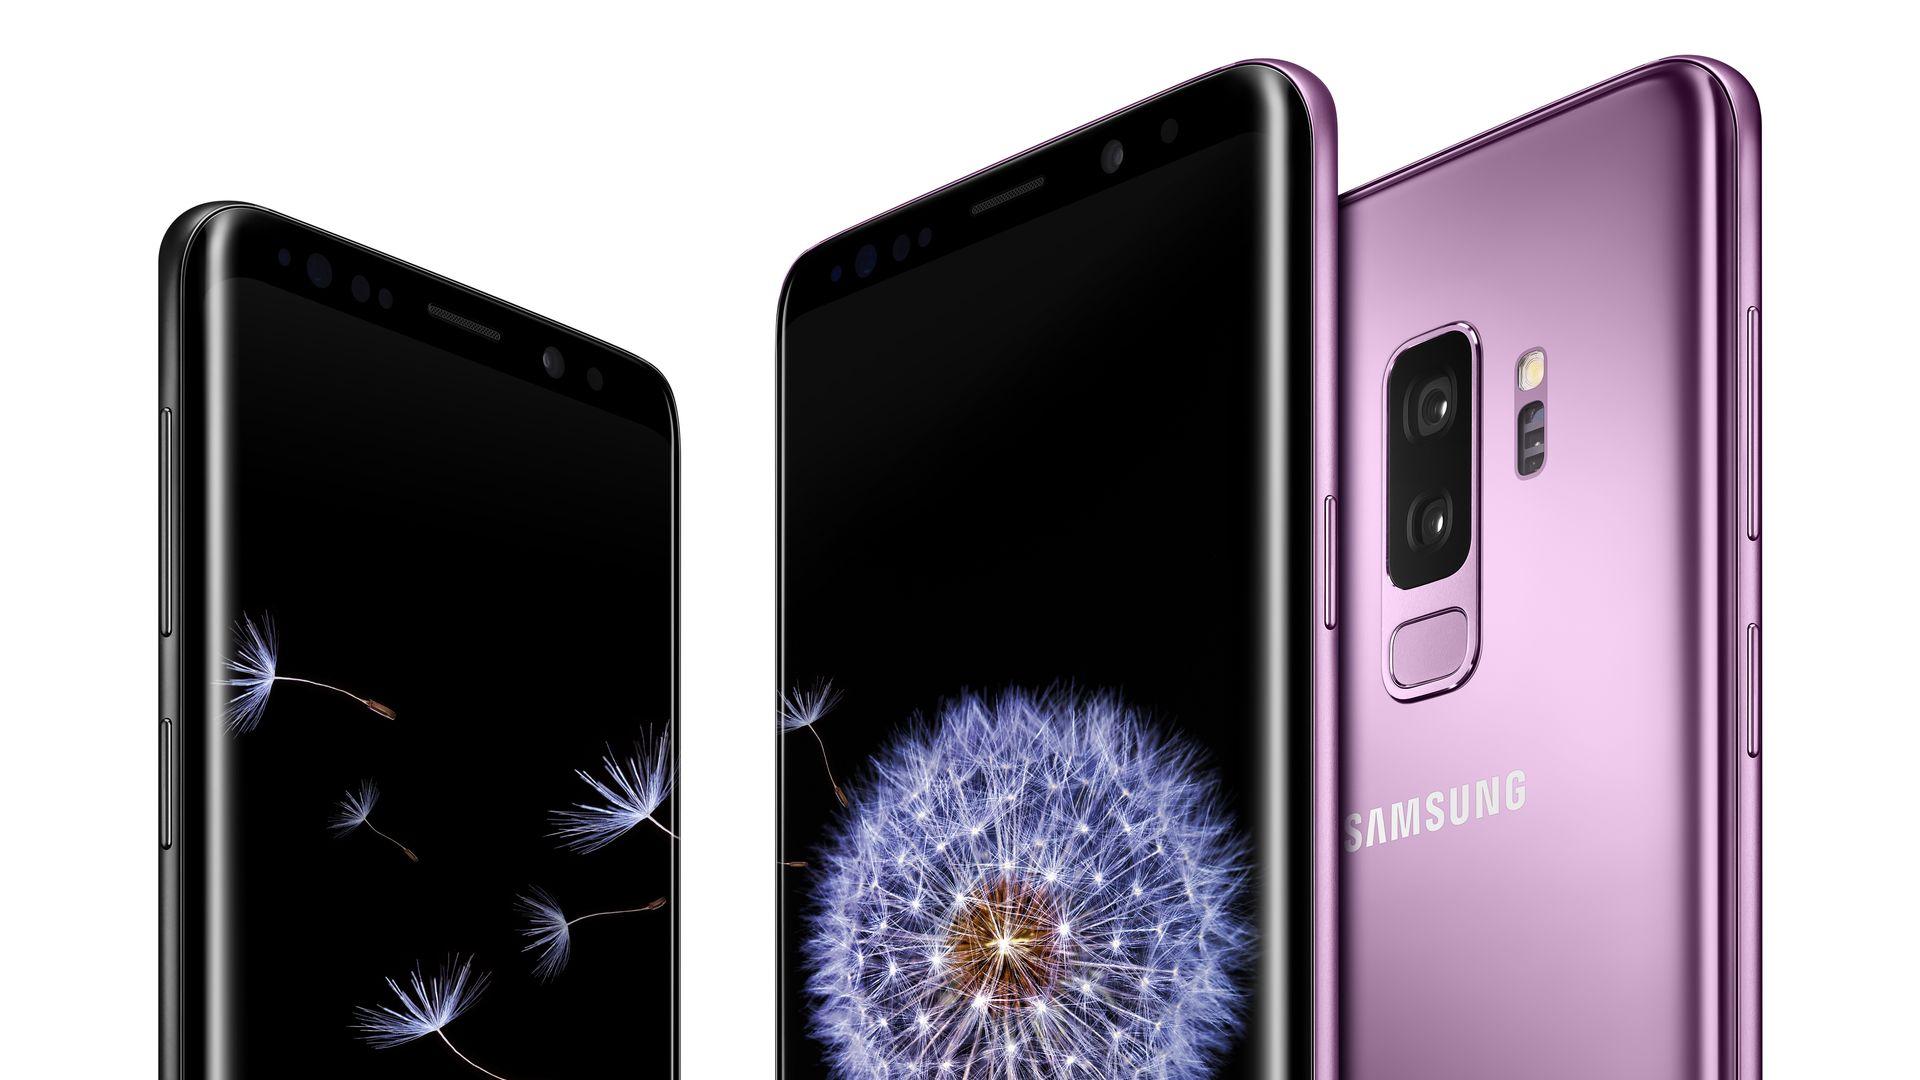 Galaxy S9 lineup